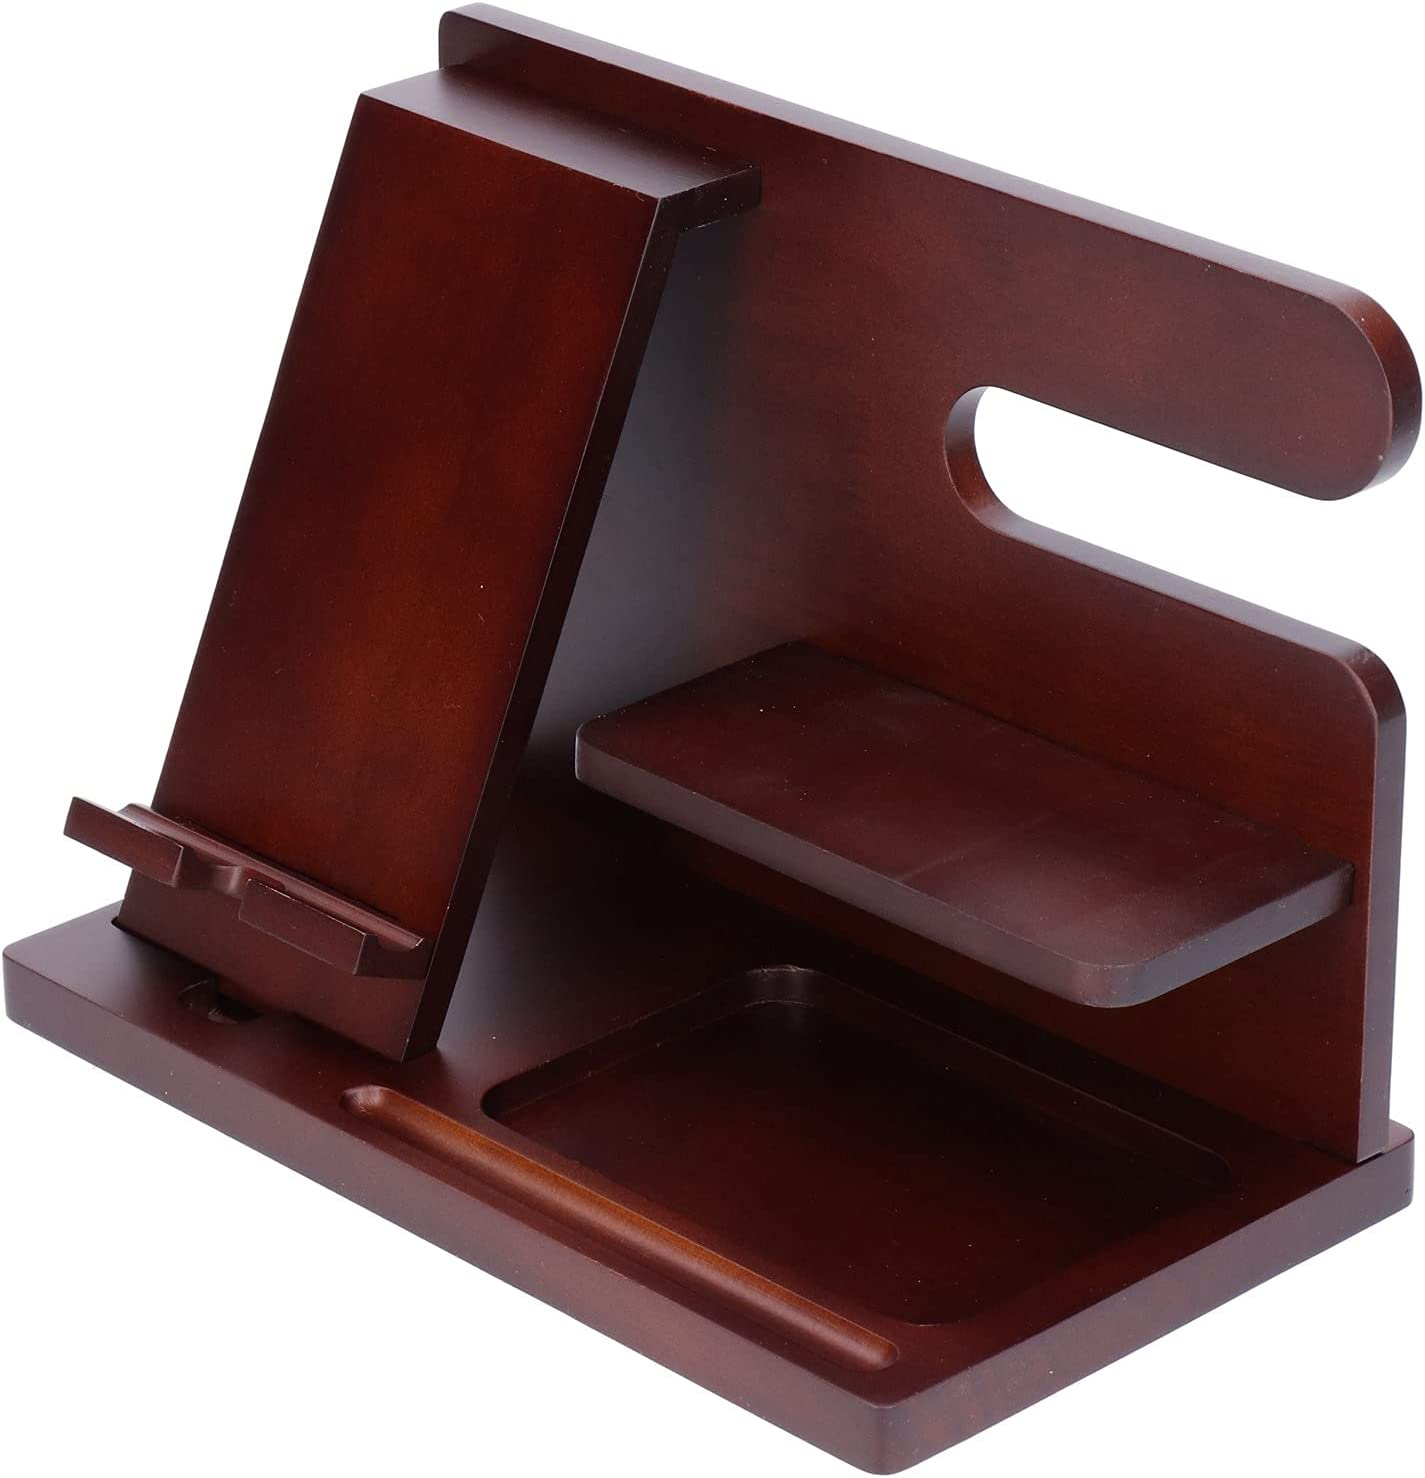 Lazmin112 NEW before selling ☆ Wood Phone Storage Desktop Tampa Mall Universal St Bracket